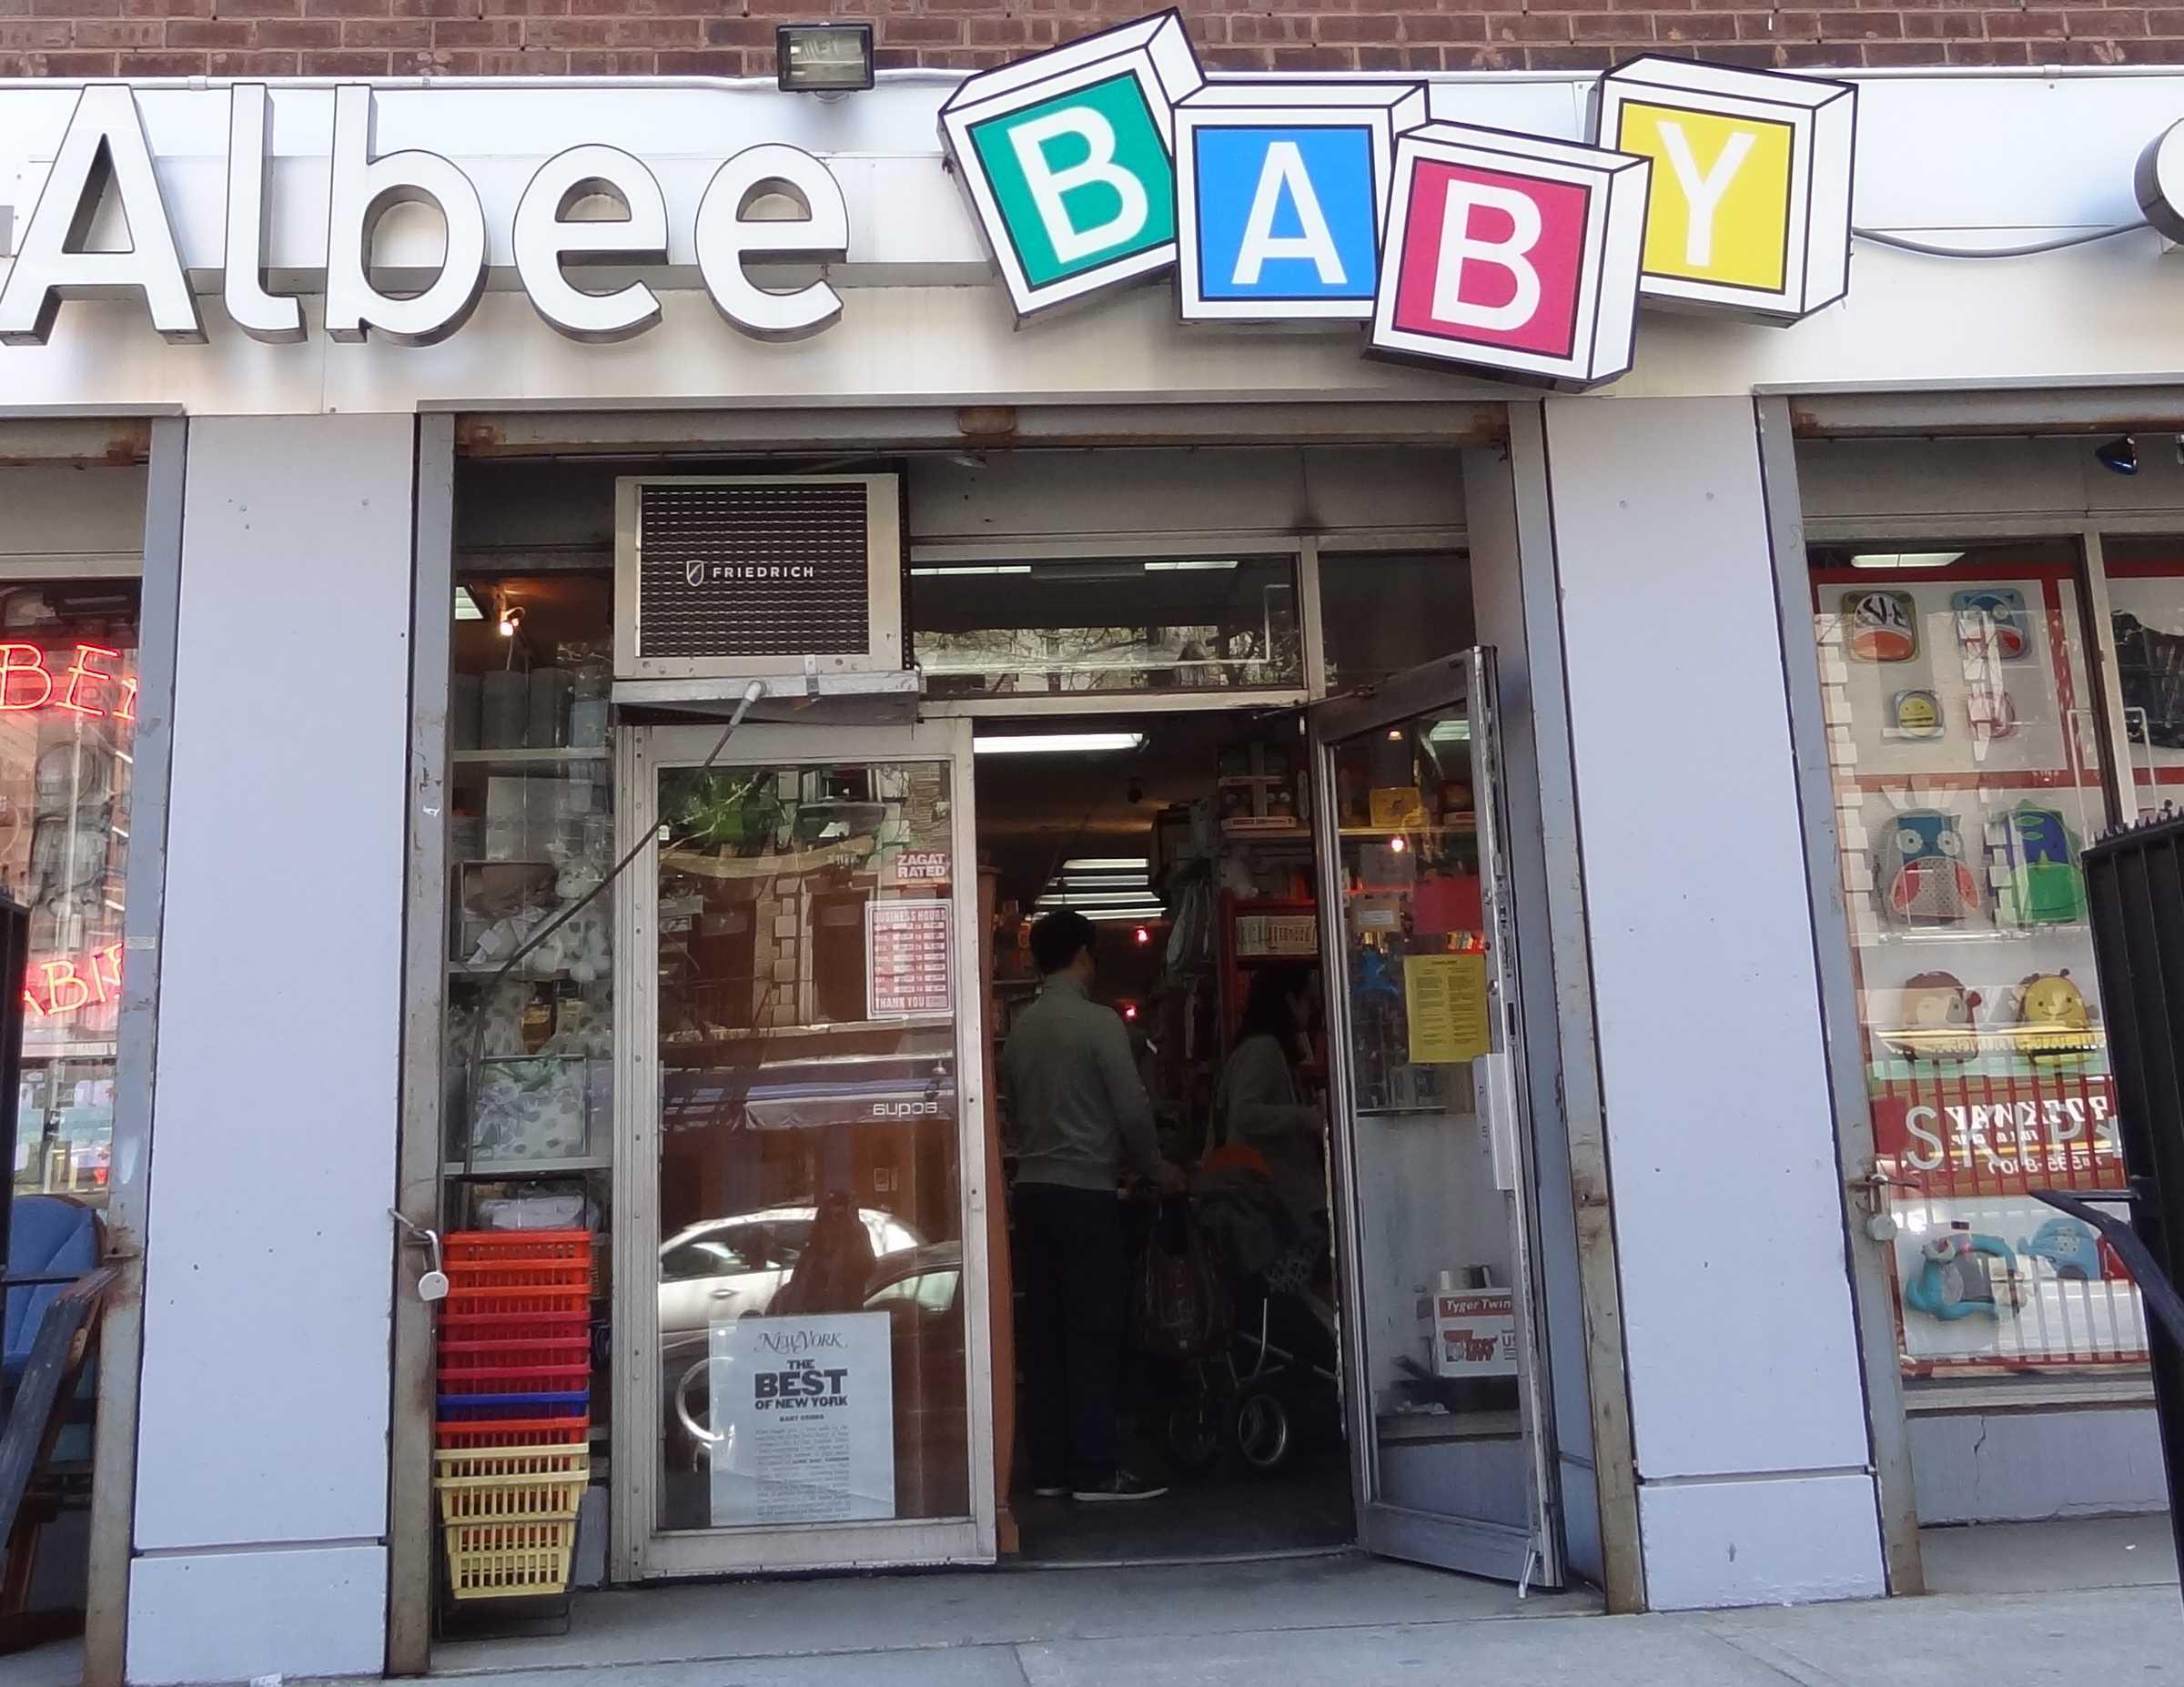 Albee Baby image 0